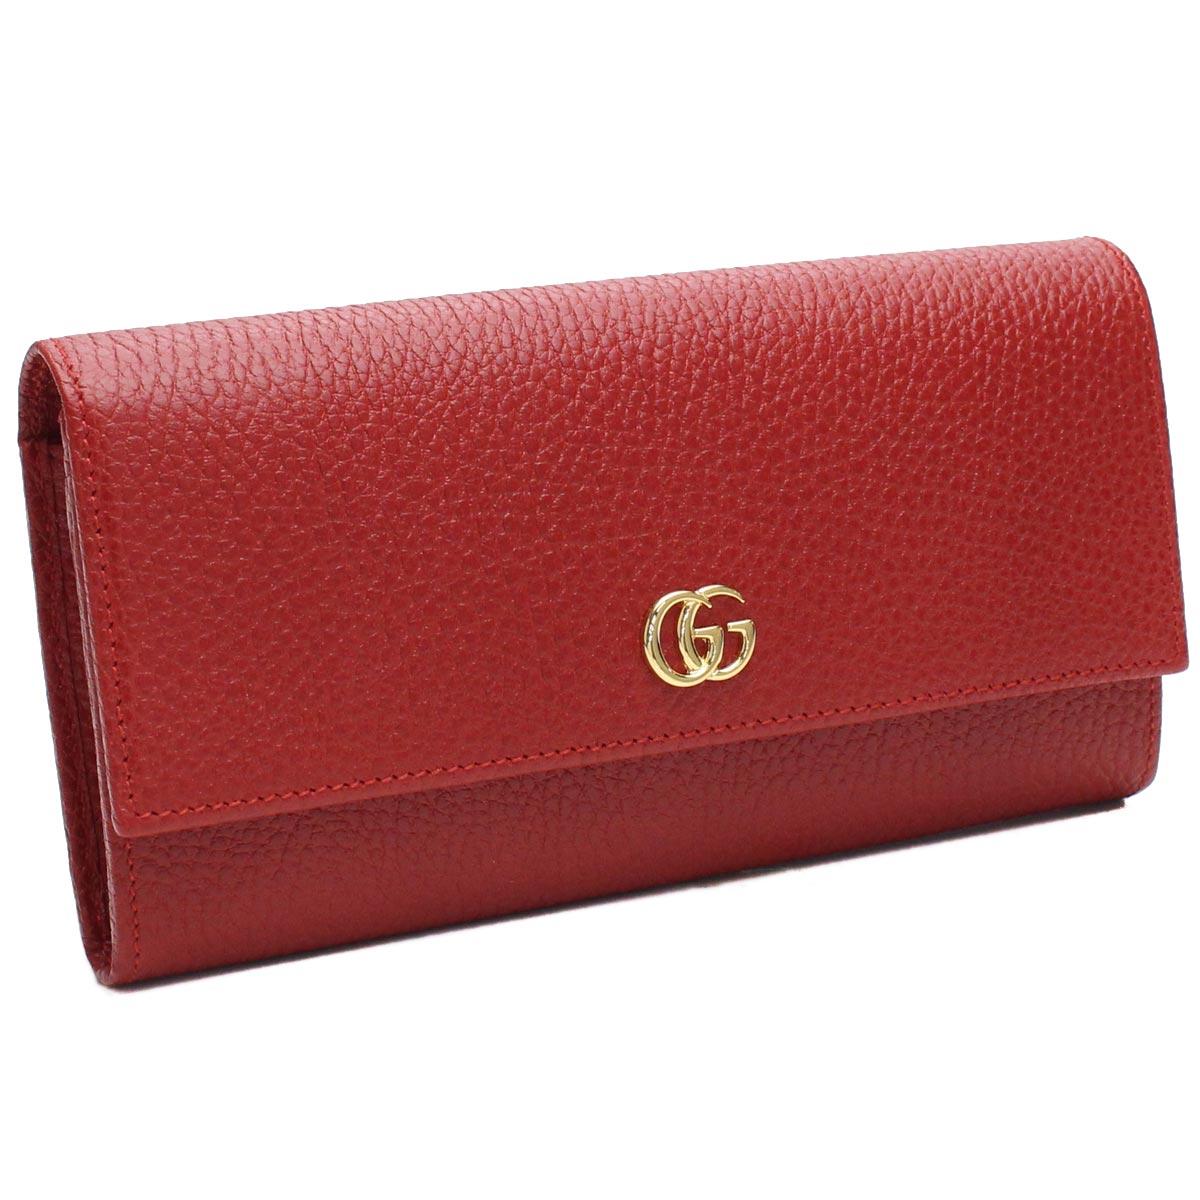 GUCCI 456116-CAO0G-6433グッチ ホック長財布レザー レッド×ゴールド